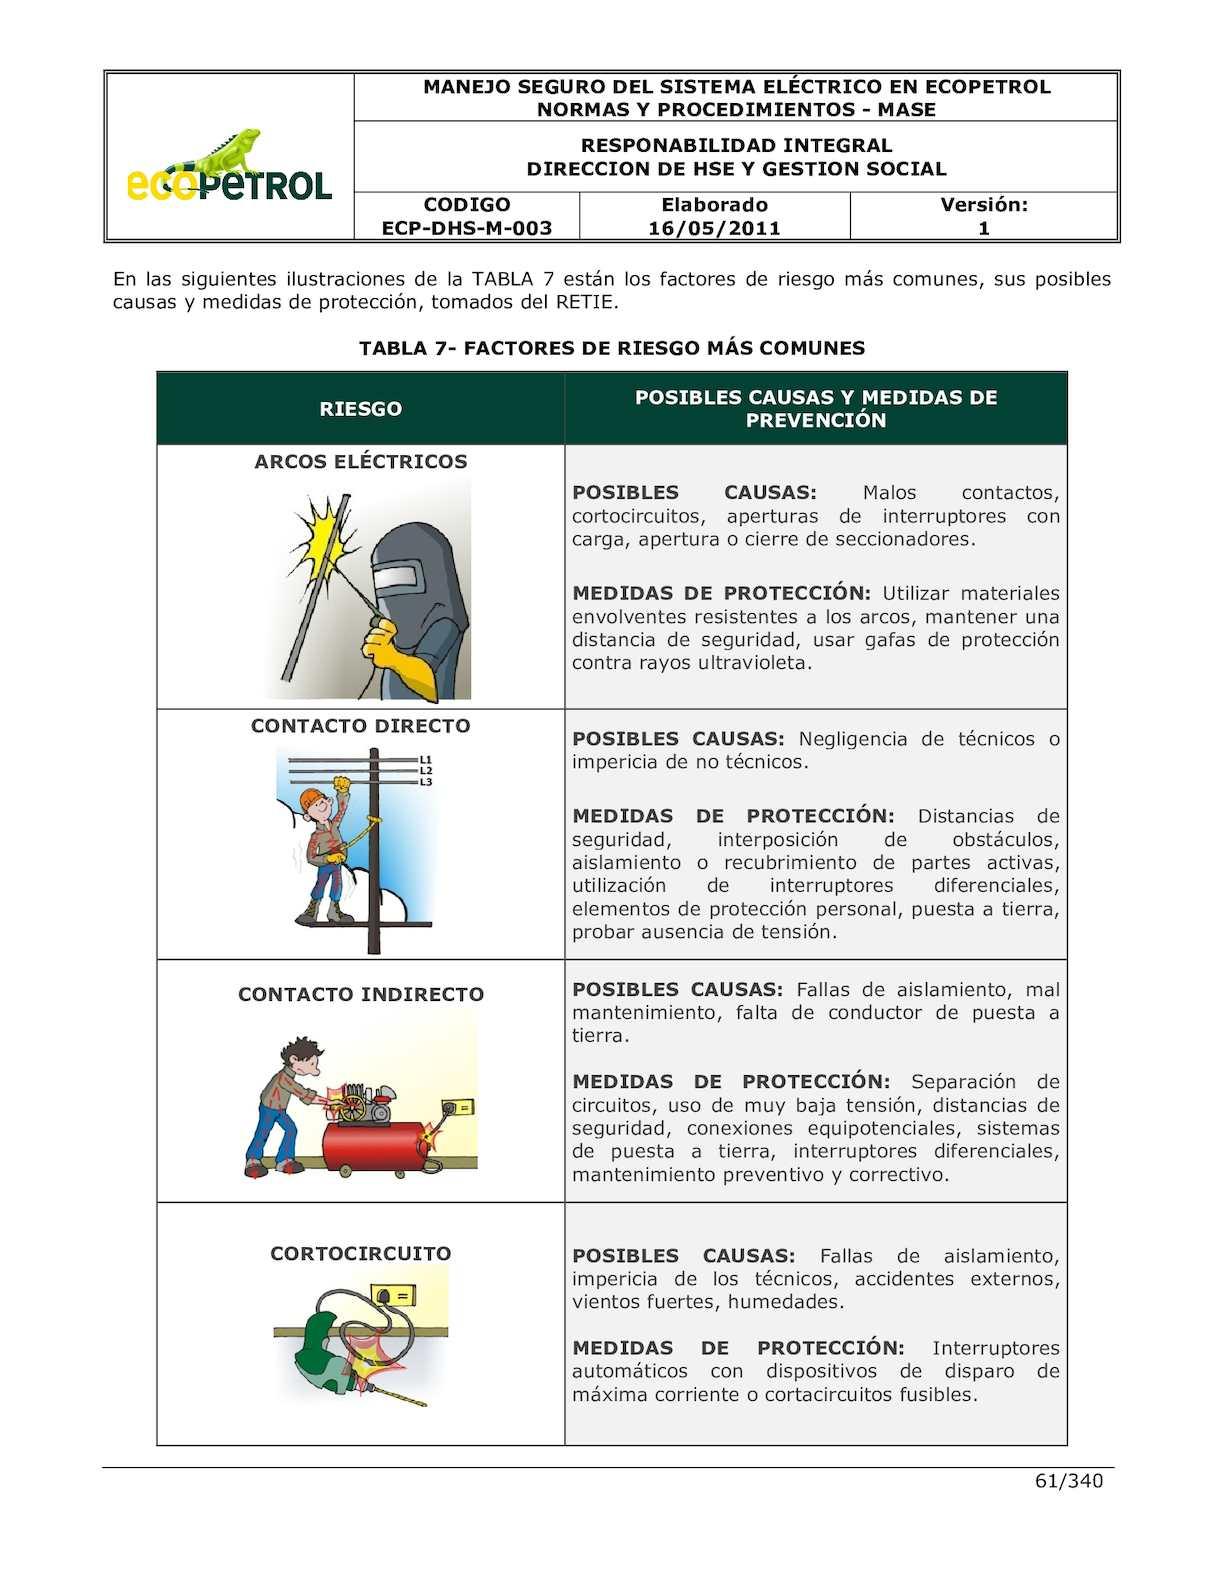 Calaméo 66789 Anexo 24 Manejo Seguro Del Sistema Eléctrico En Ecopetrol Parte 3